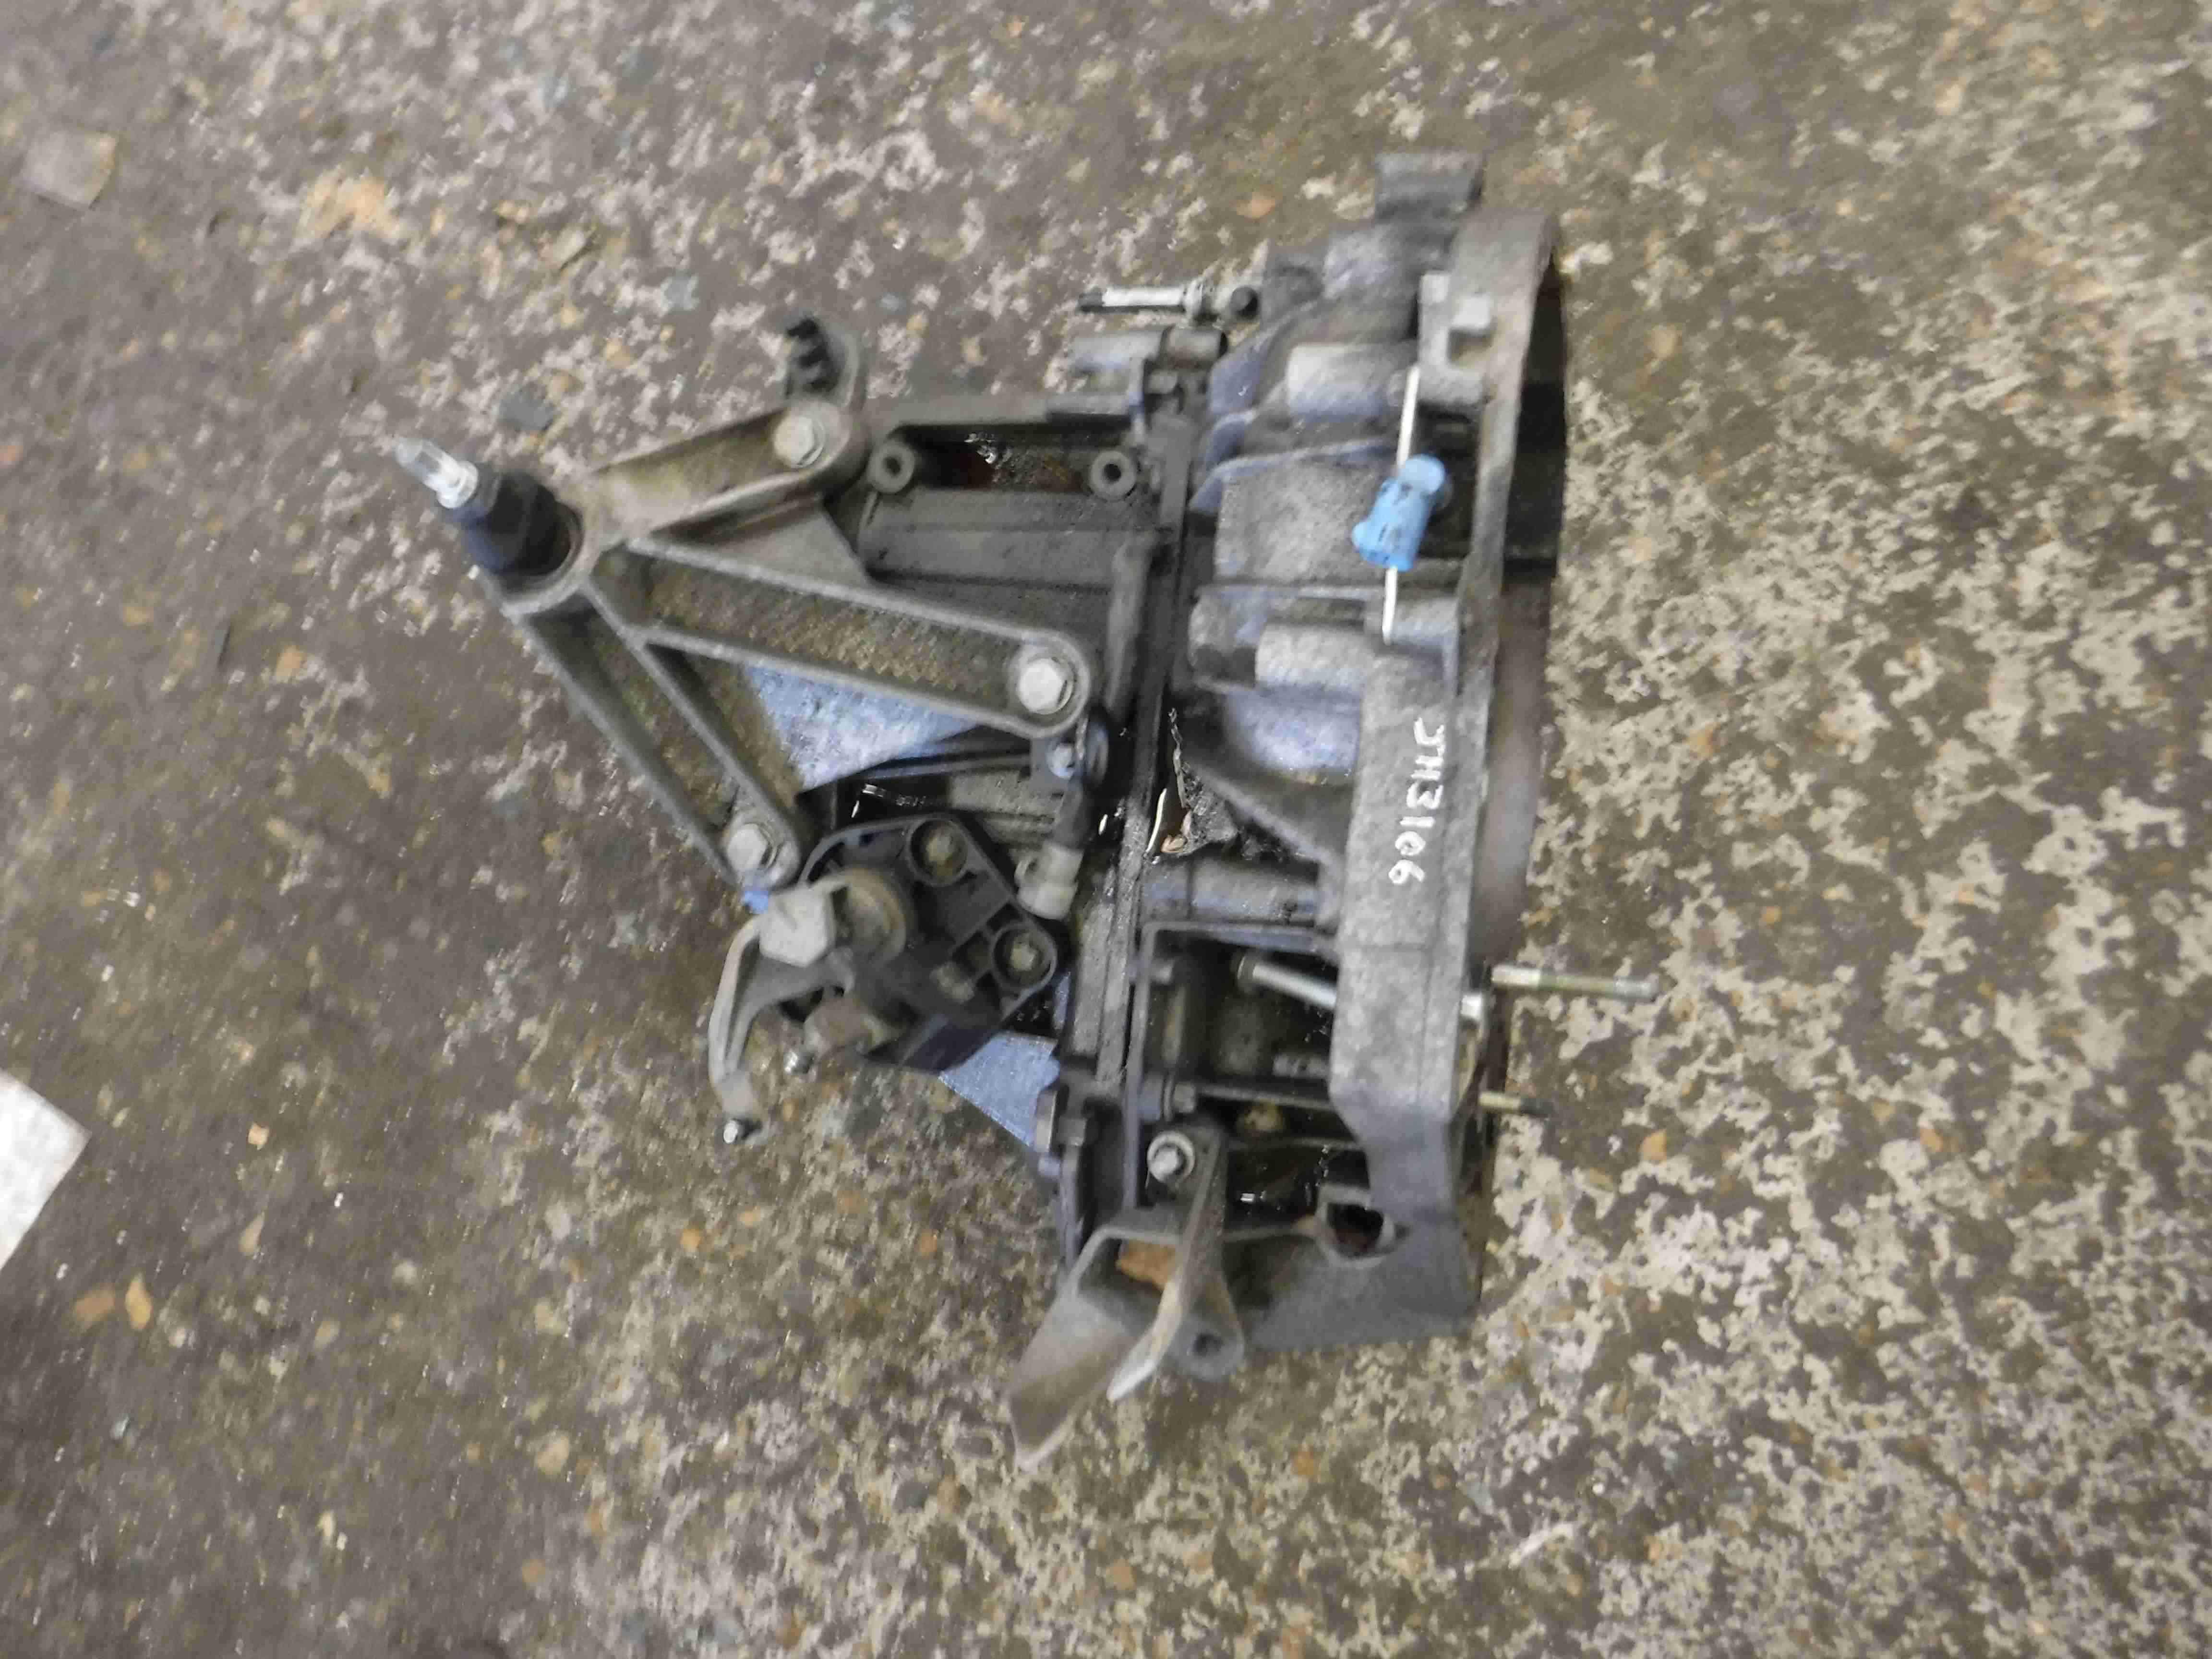 Renault Megane Scenic 2003-2009  1.4 16v Gearbox JH3 106